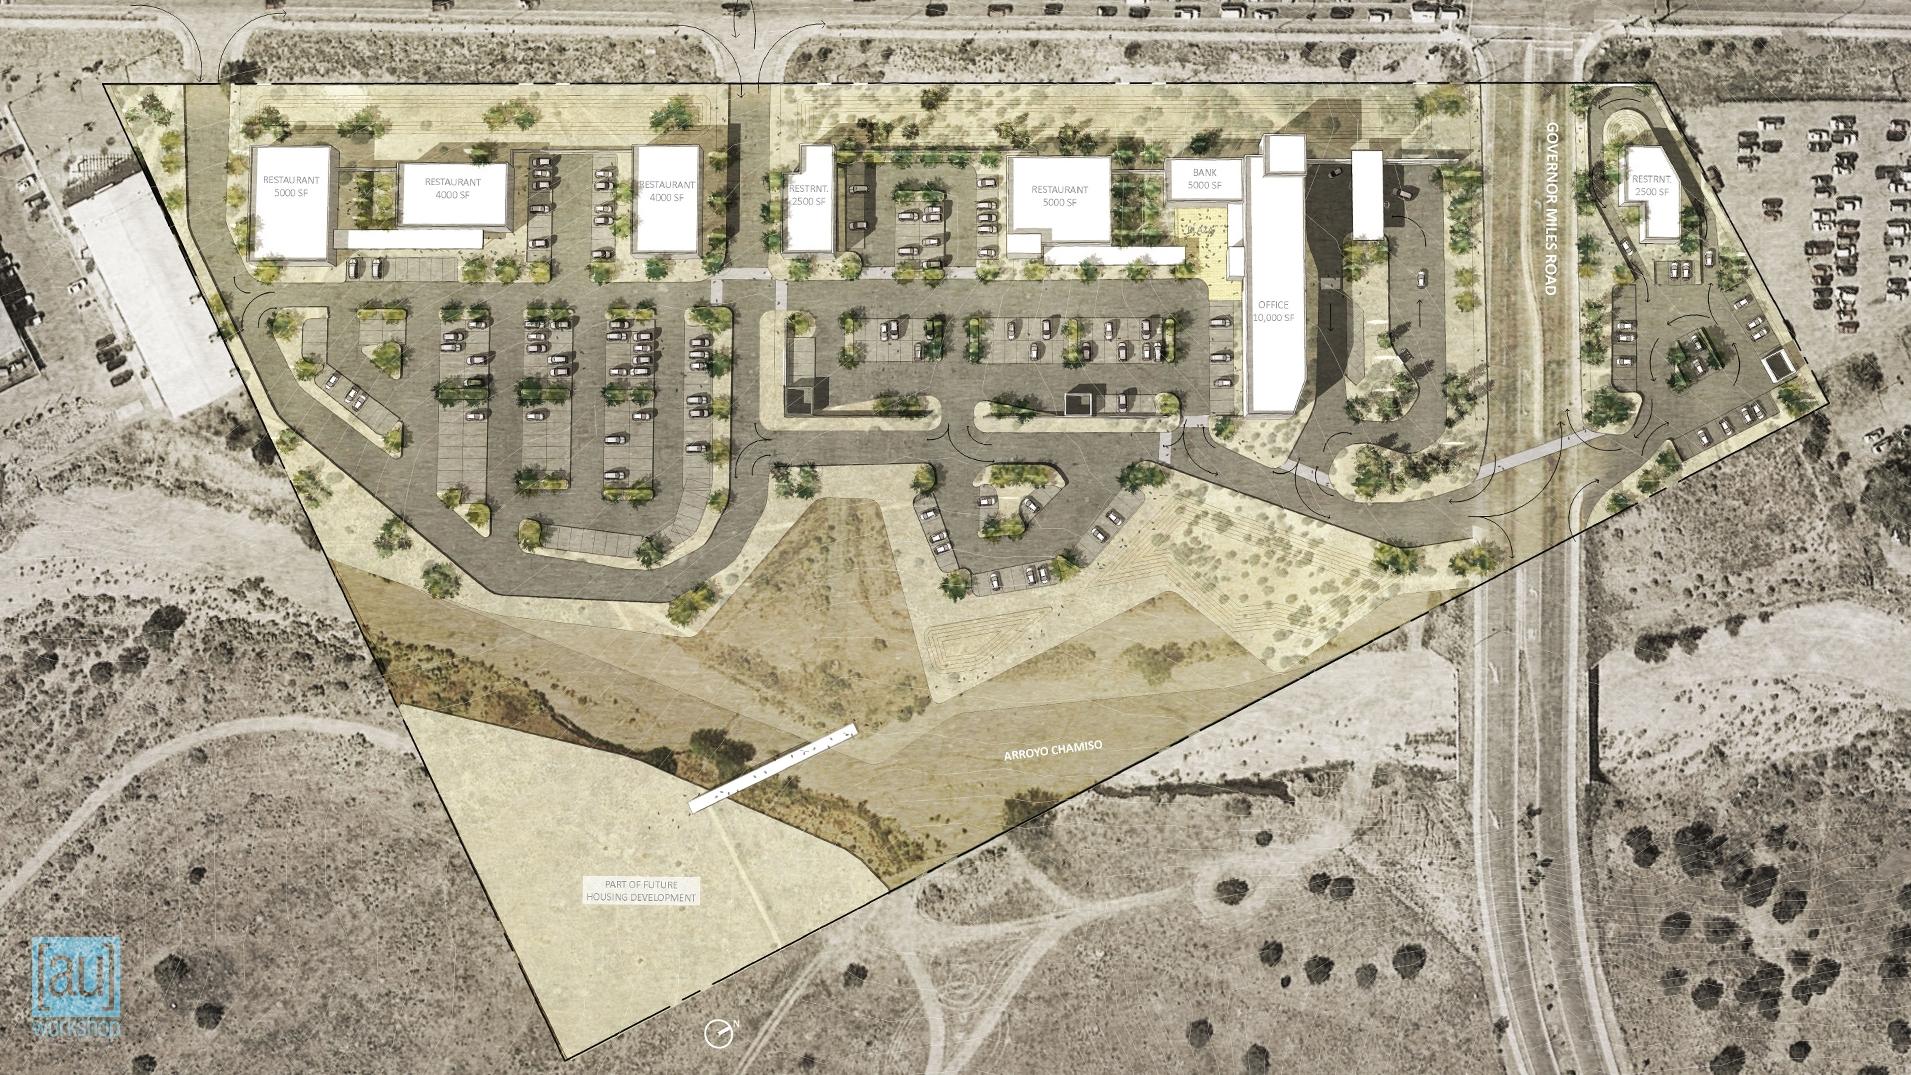 Early Conceptual Site Plan